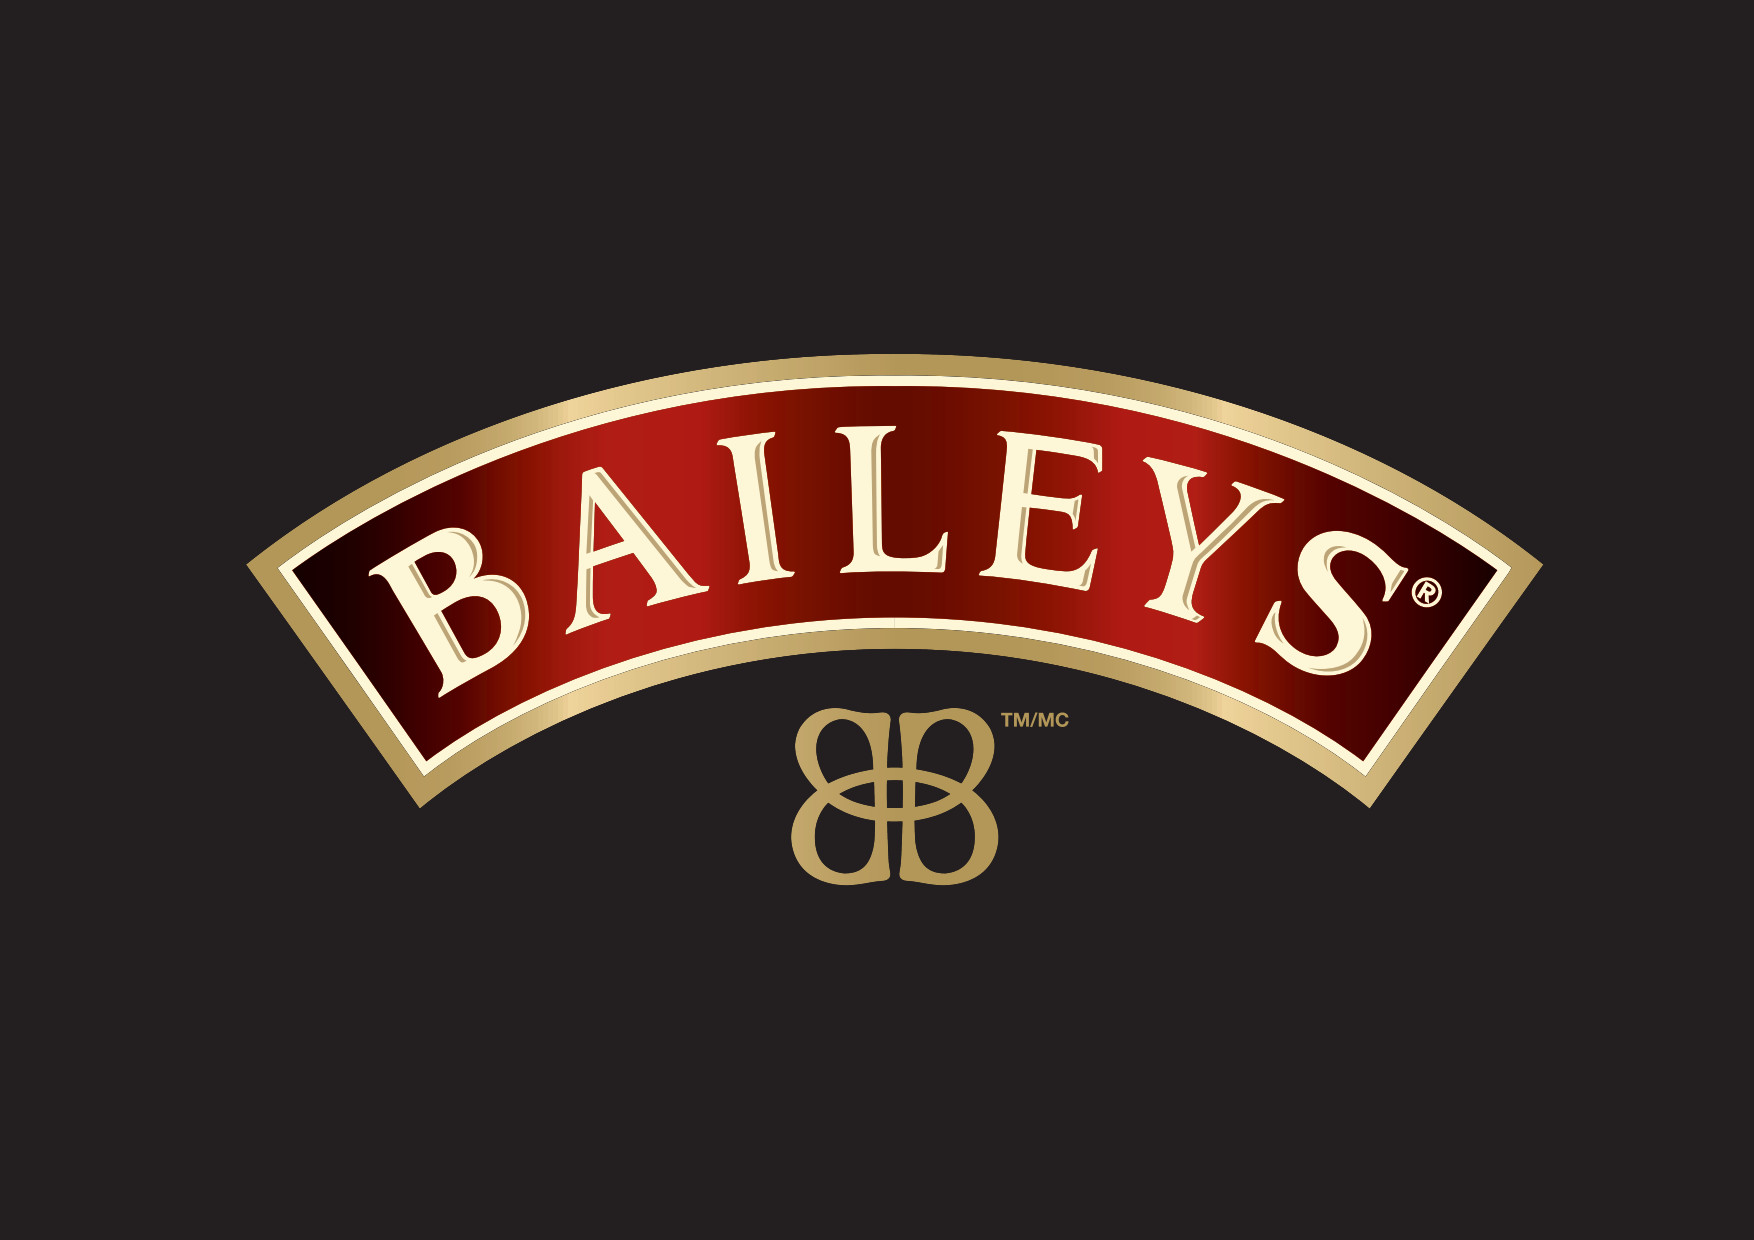 Baileys logo clipart free stock Baileys Warming House - Saint Paul Winter Carnival free stock